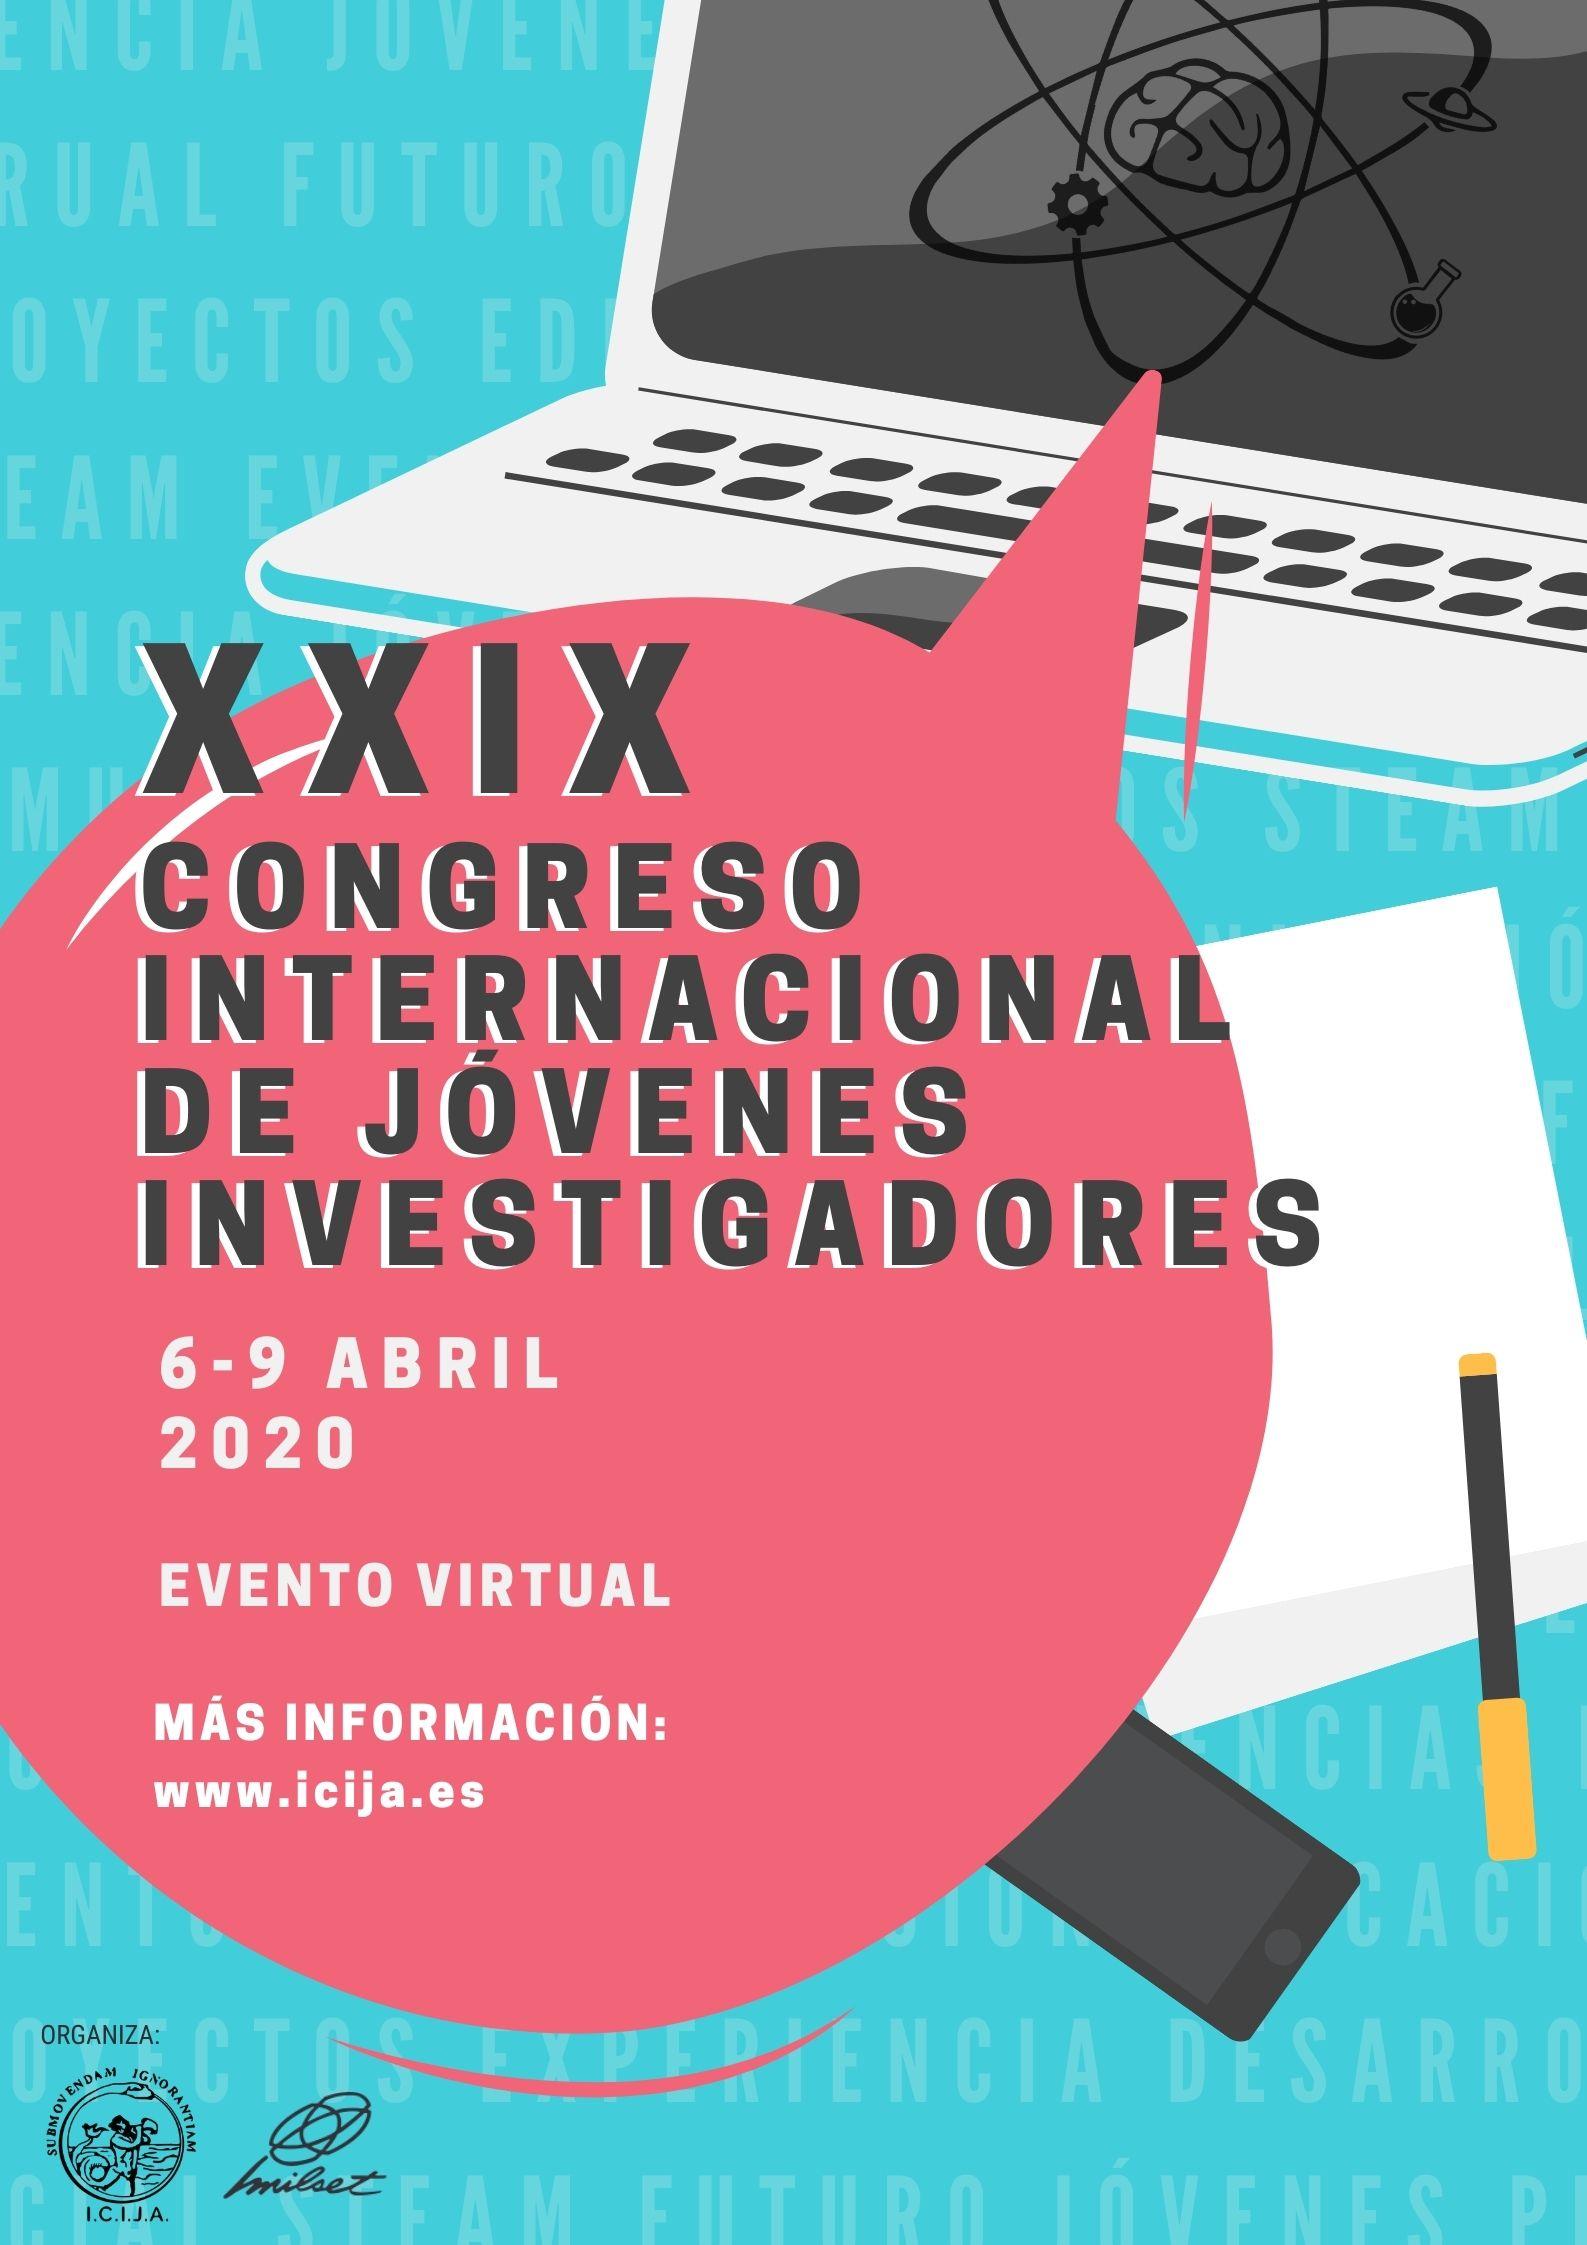 Cartel_XXIX Congreso Internacional